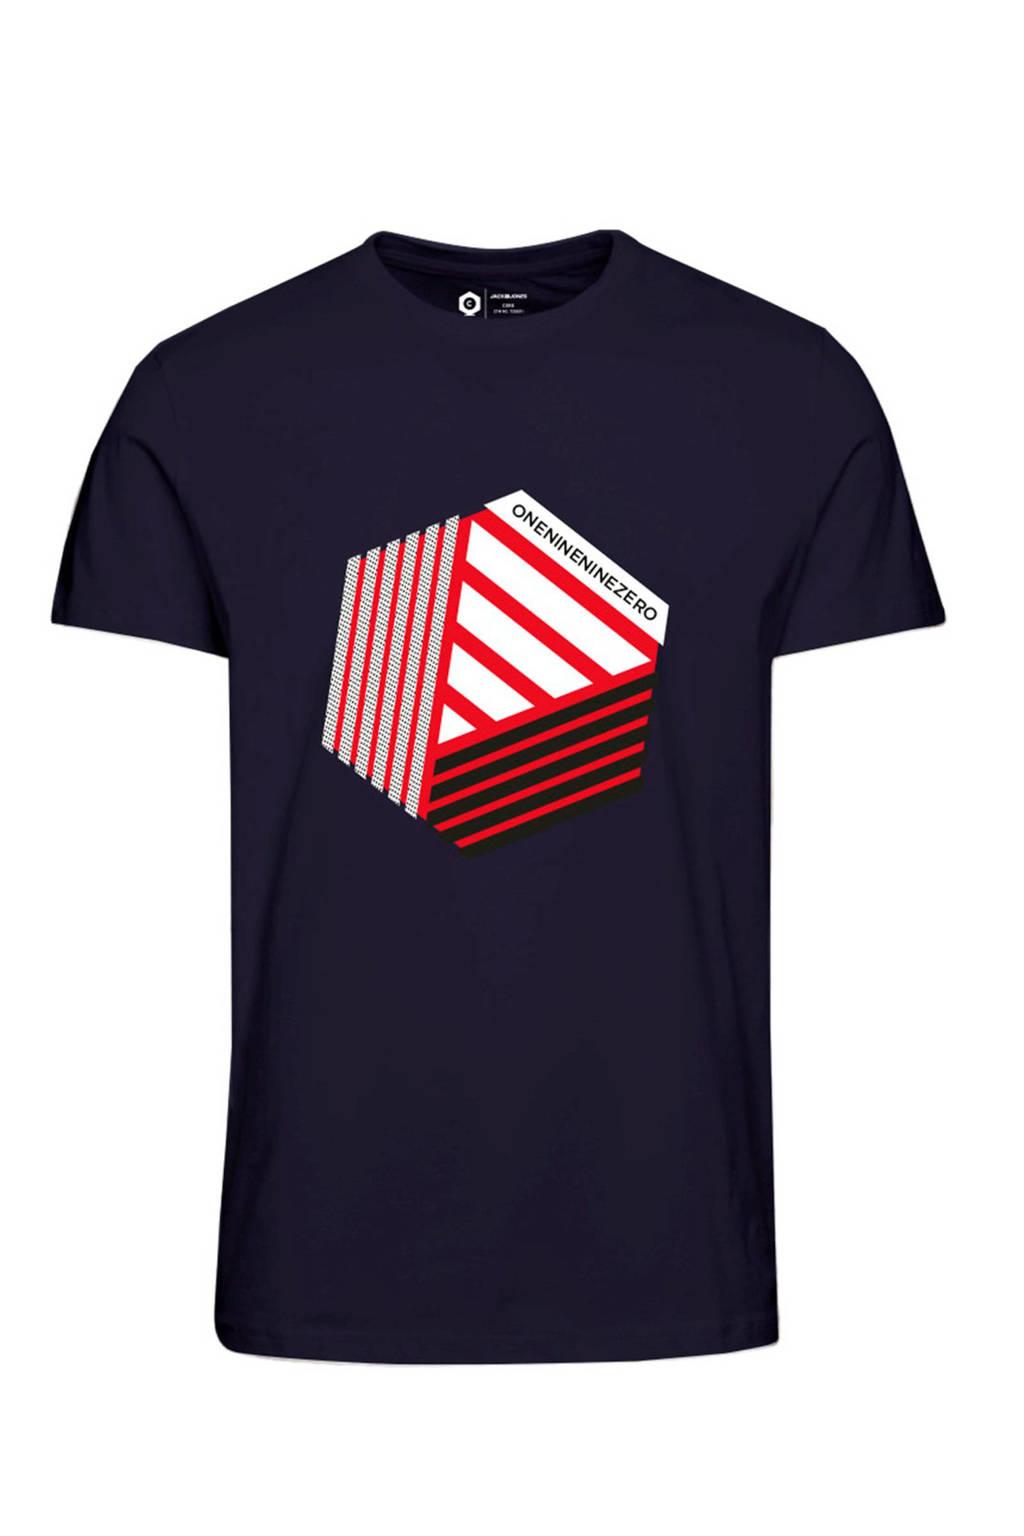 JACK & JONES CORE T-shirt met printopdruk, Marine